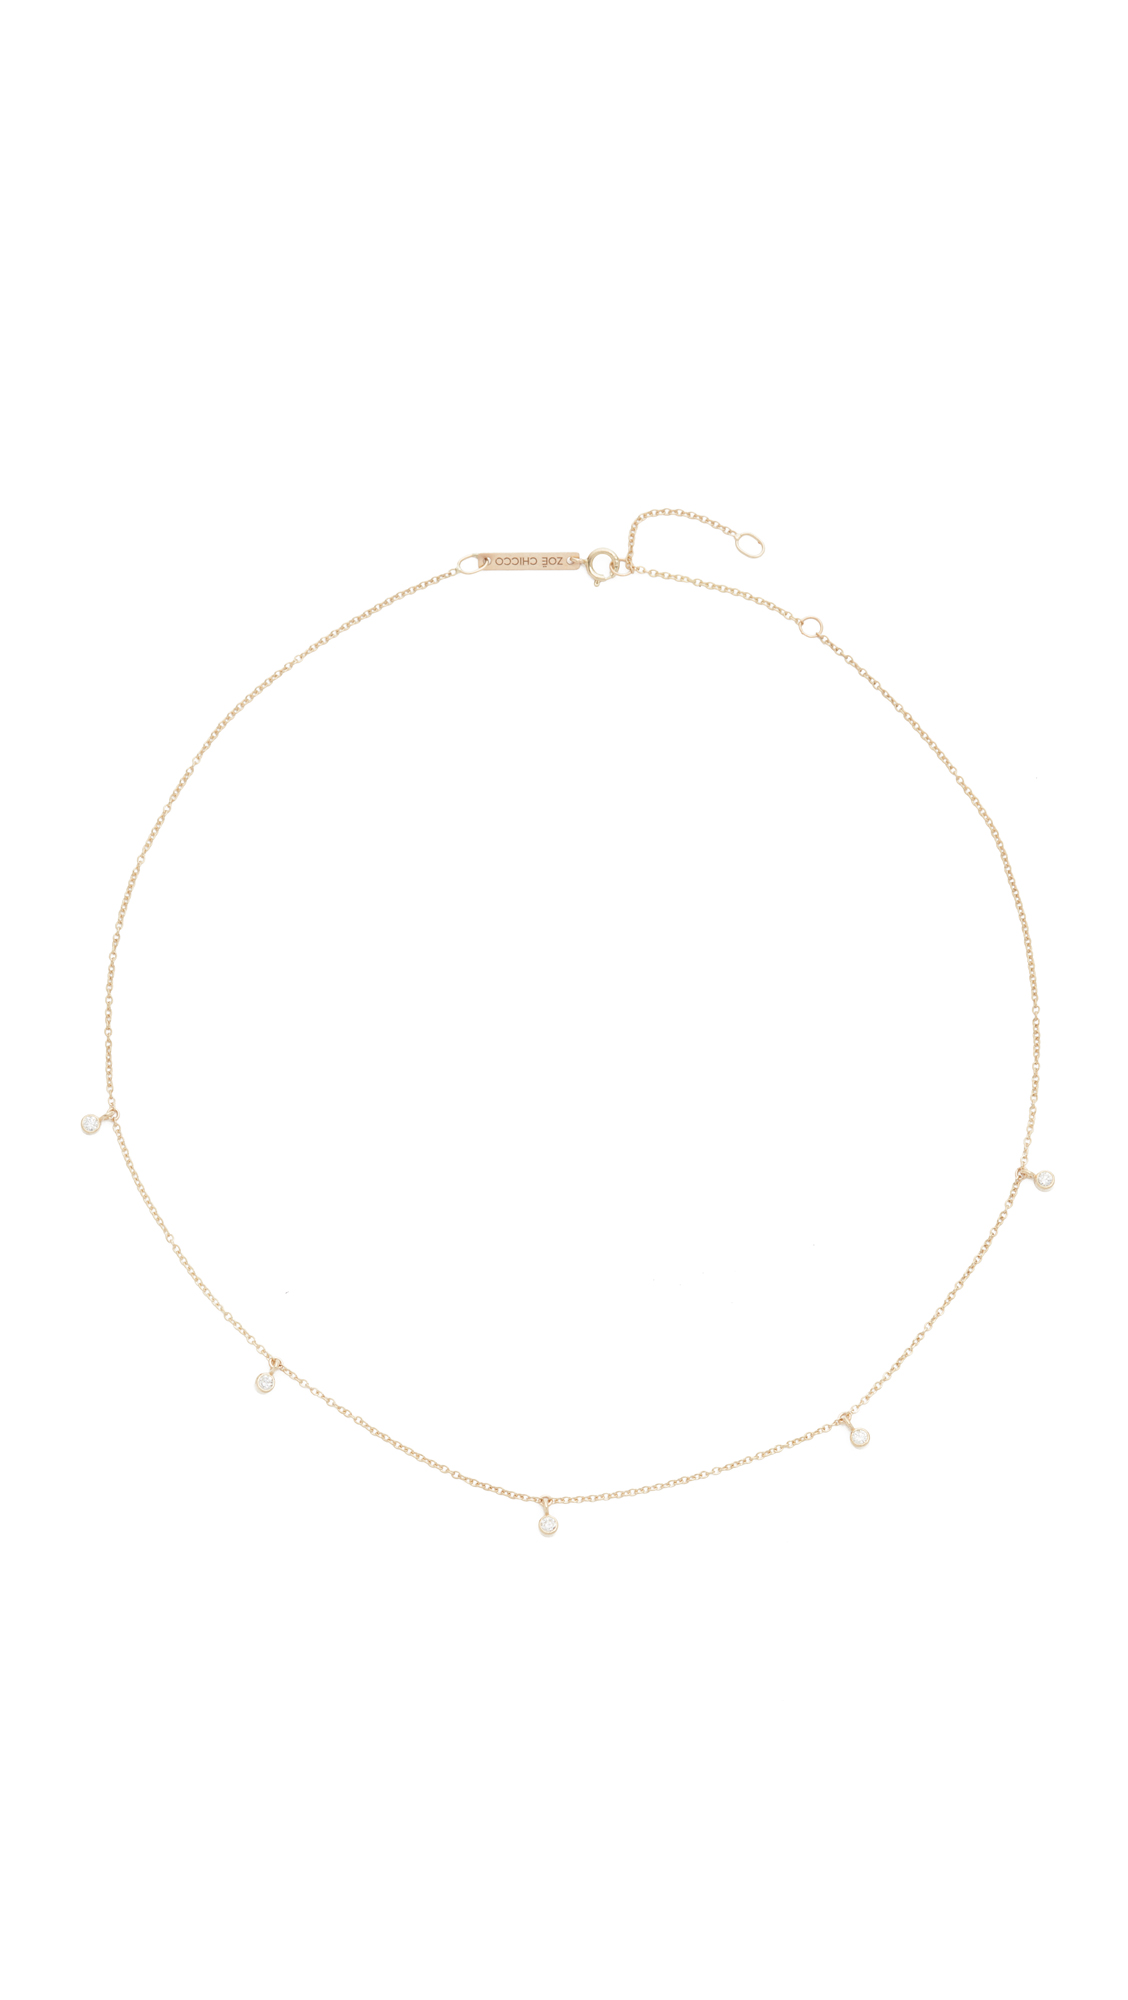 Zoë Chicco 14k Gold One Diamond Chain Choker Necklace R49tGN